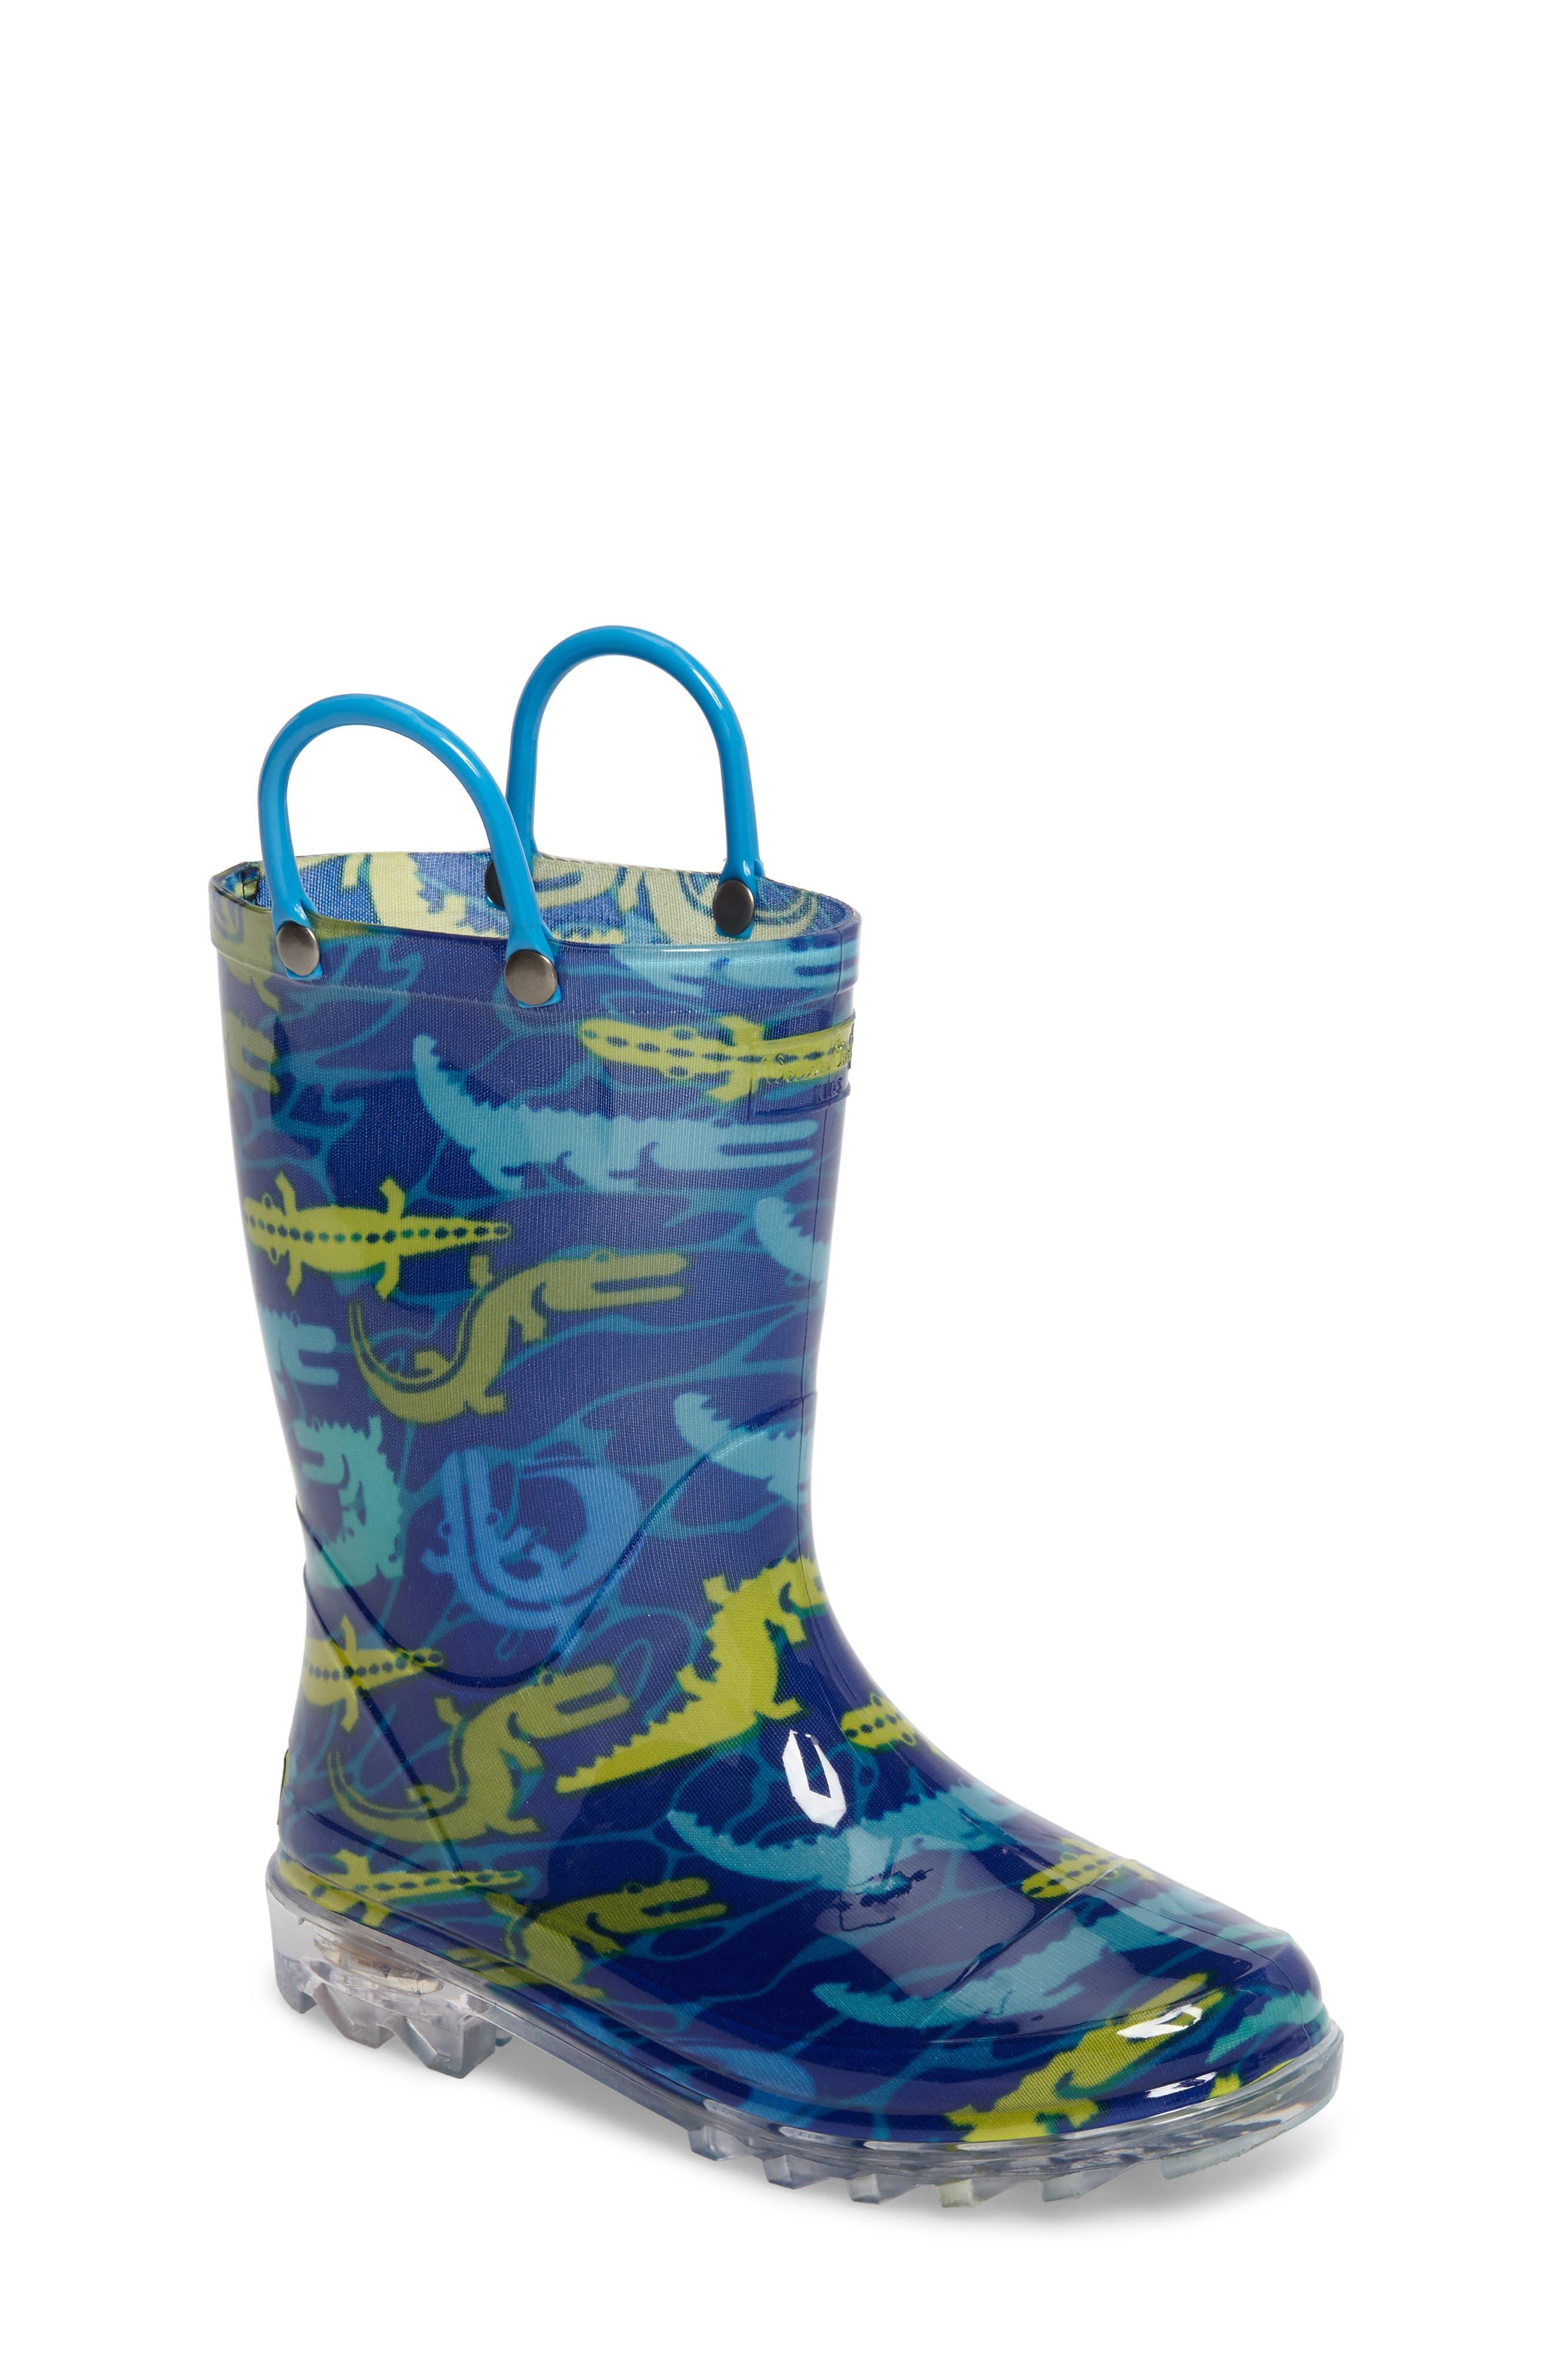 Main Image - Western Chief Gators Galore Light-Up Rain Boot (Toddler & Little Kid)